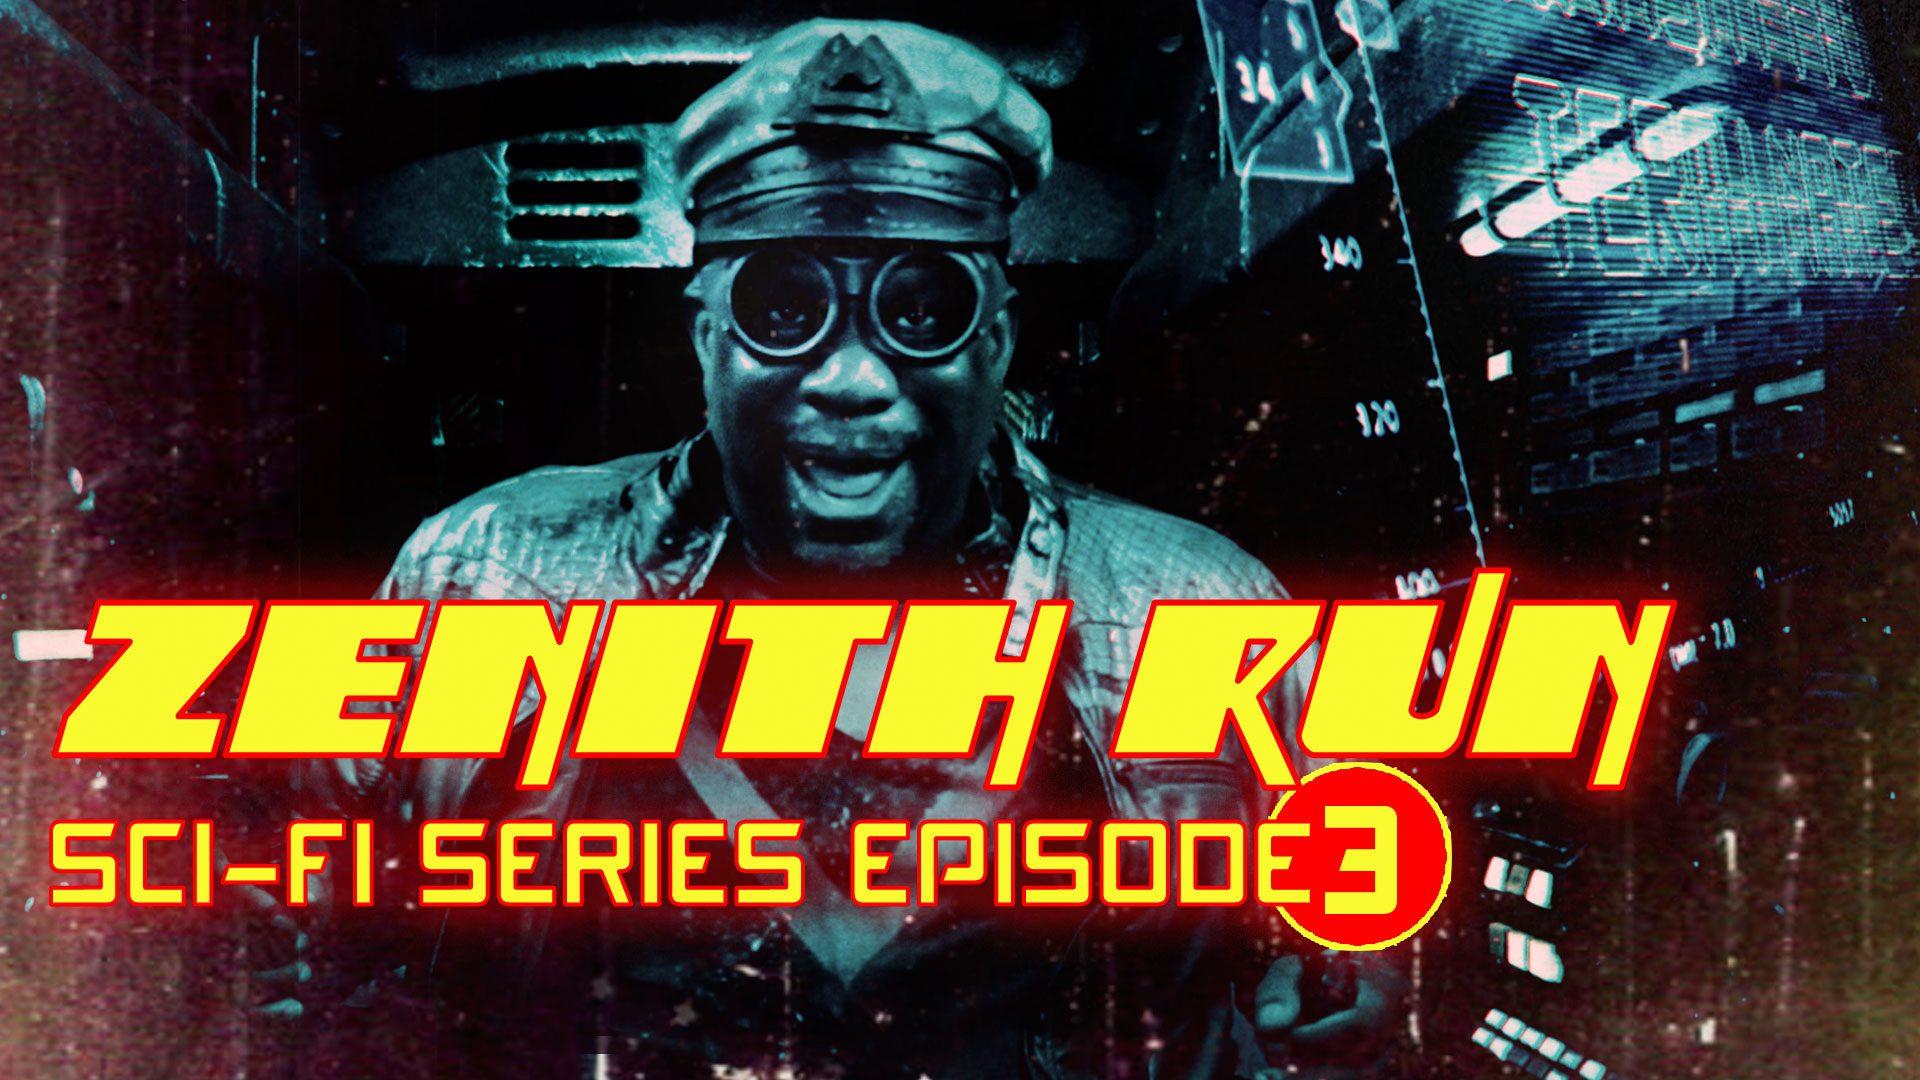 Zenith Run Episode 3